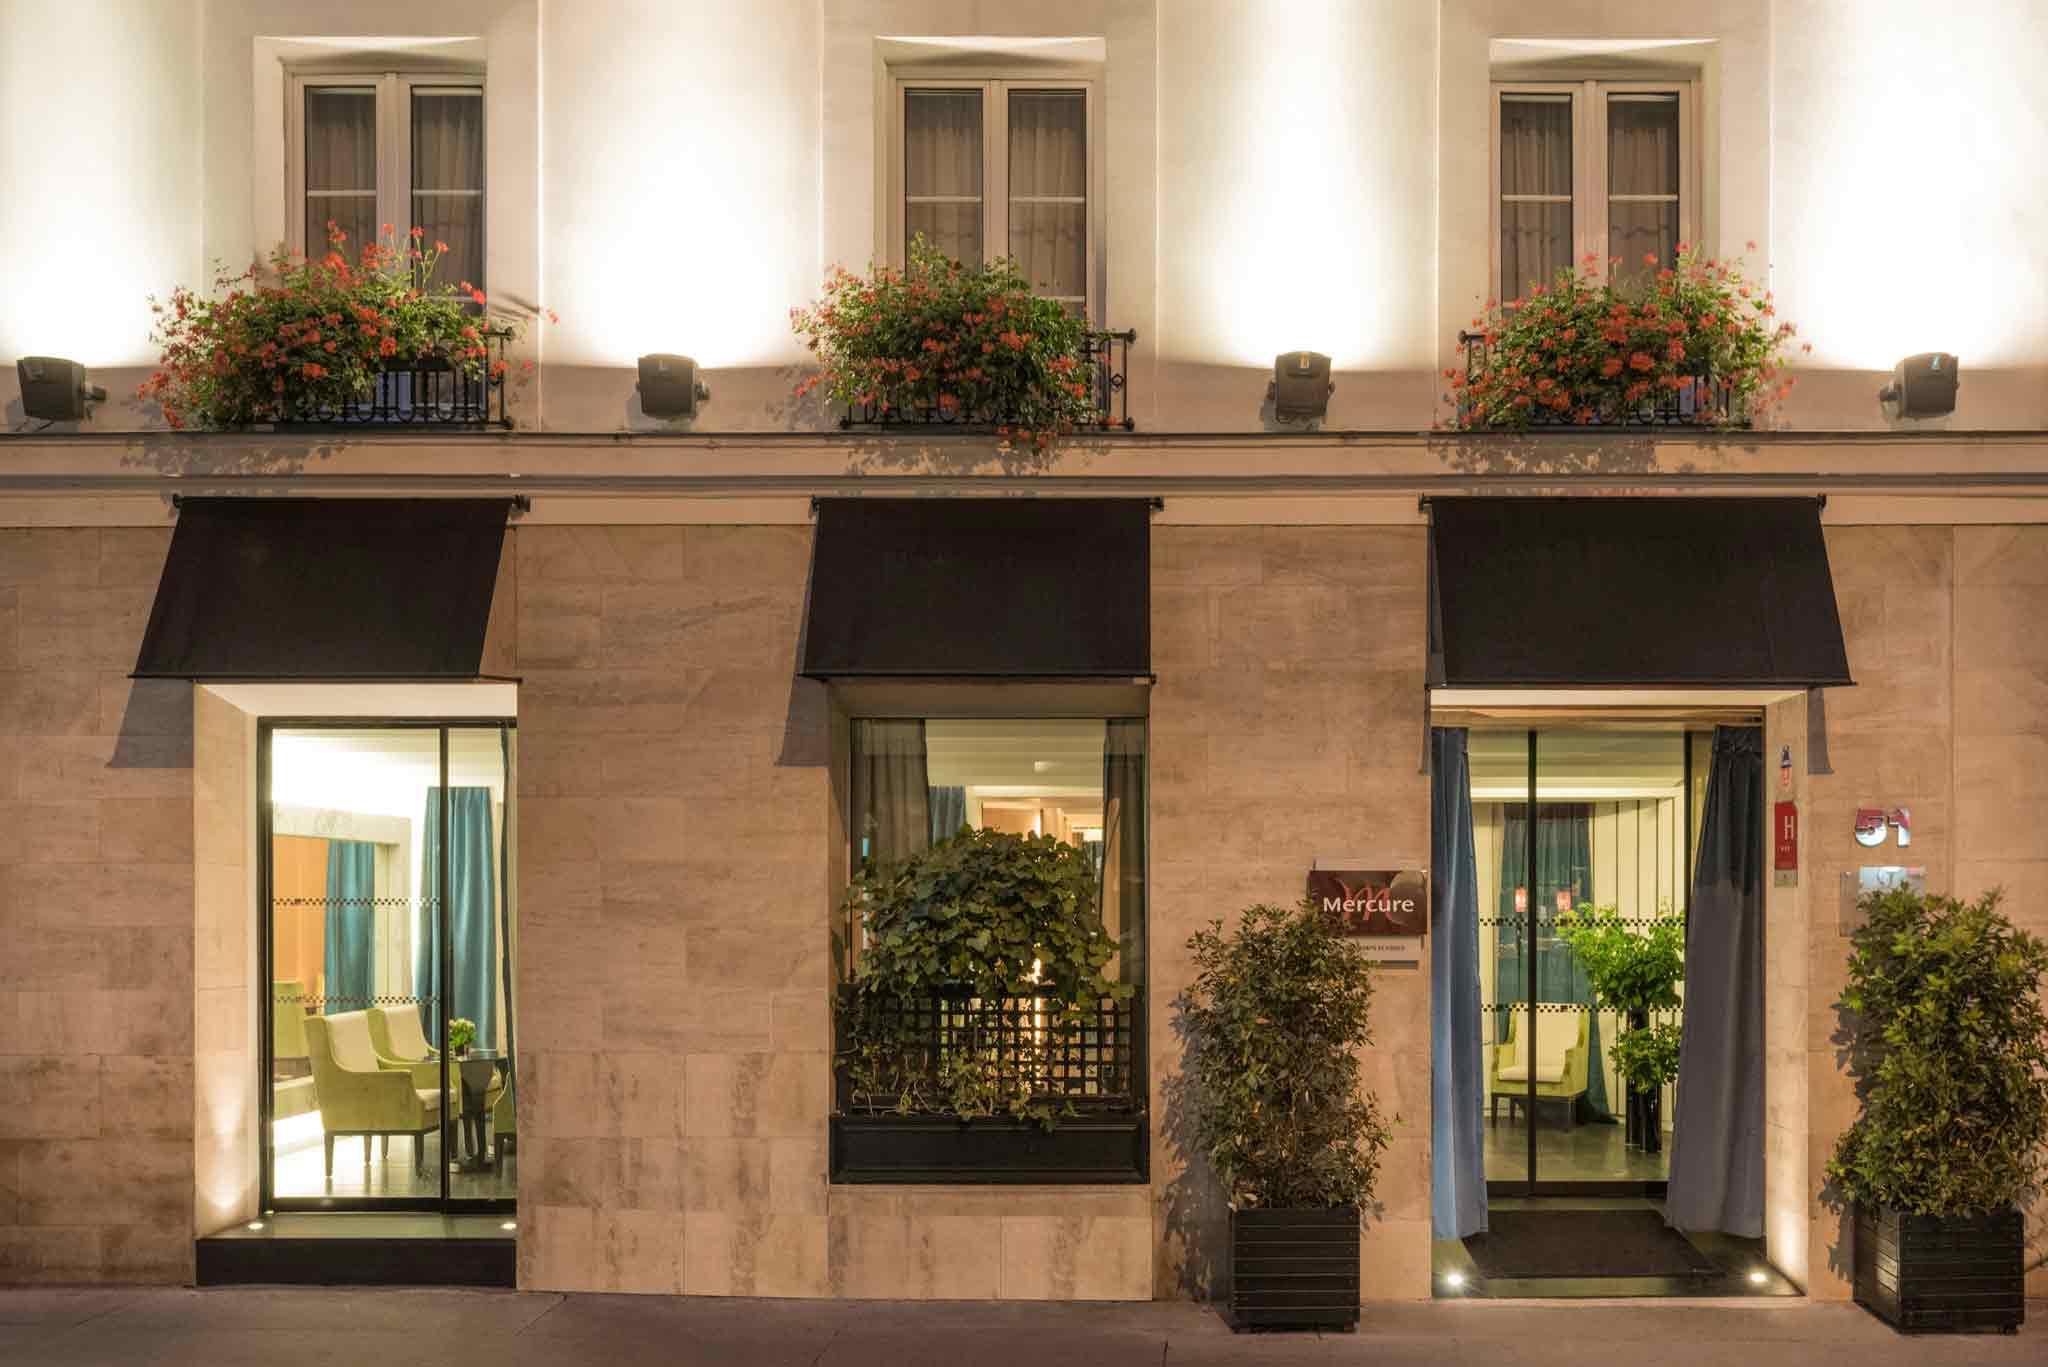 Hotel – Albergo Mercure Parigi Champs Elysées